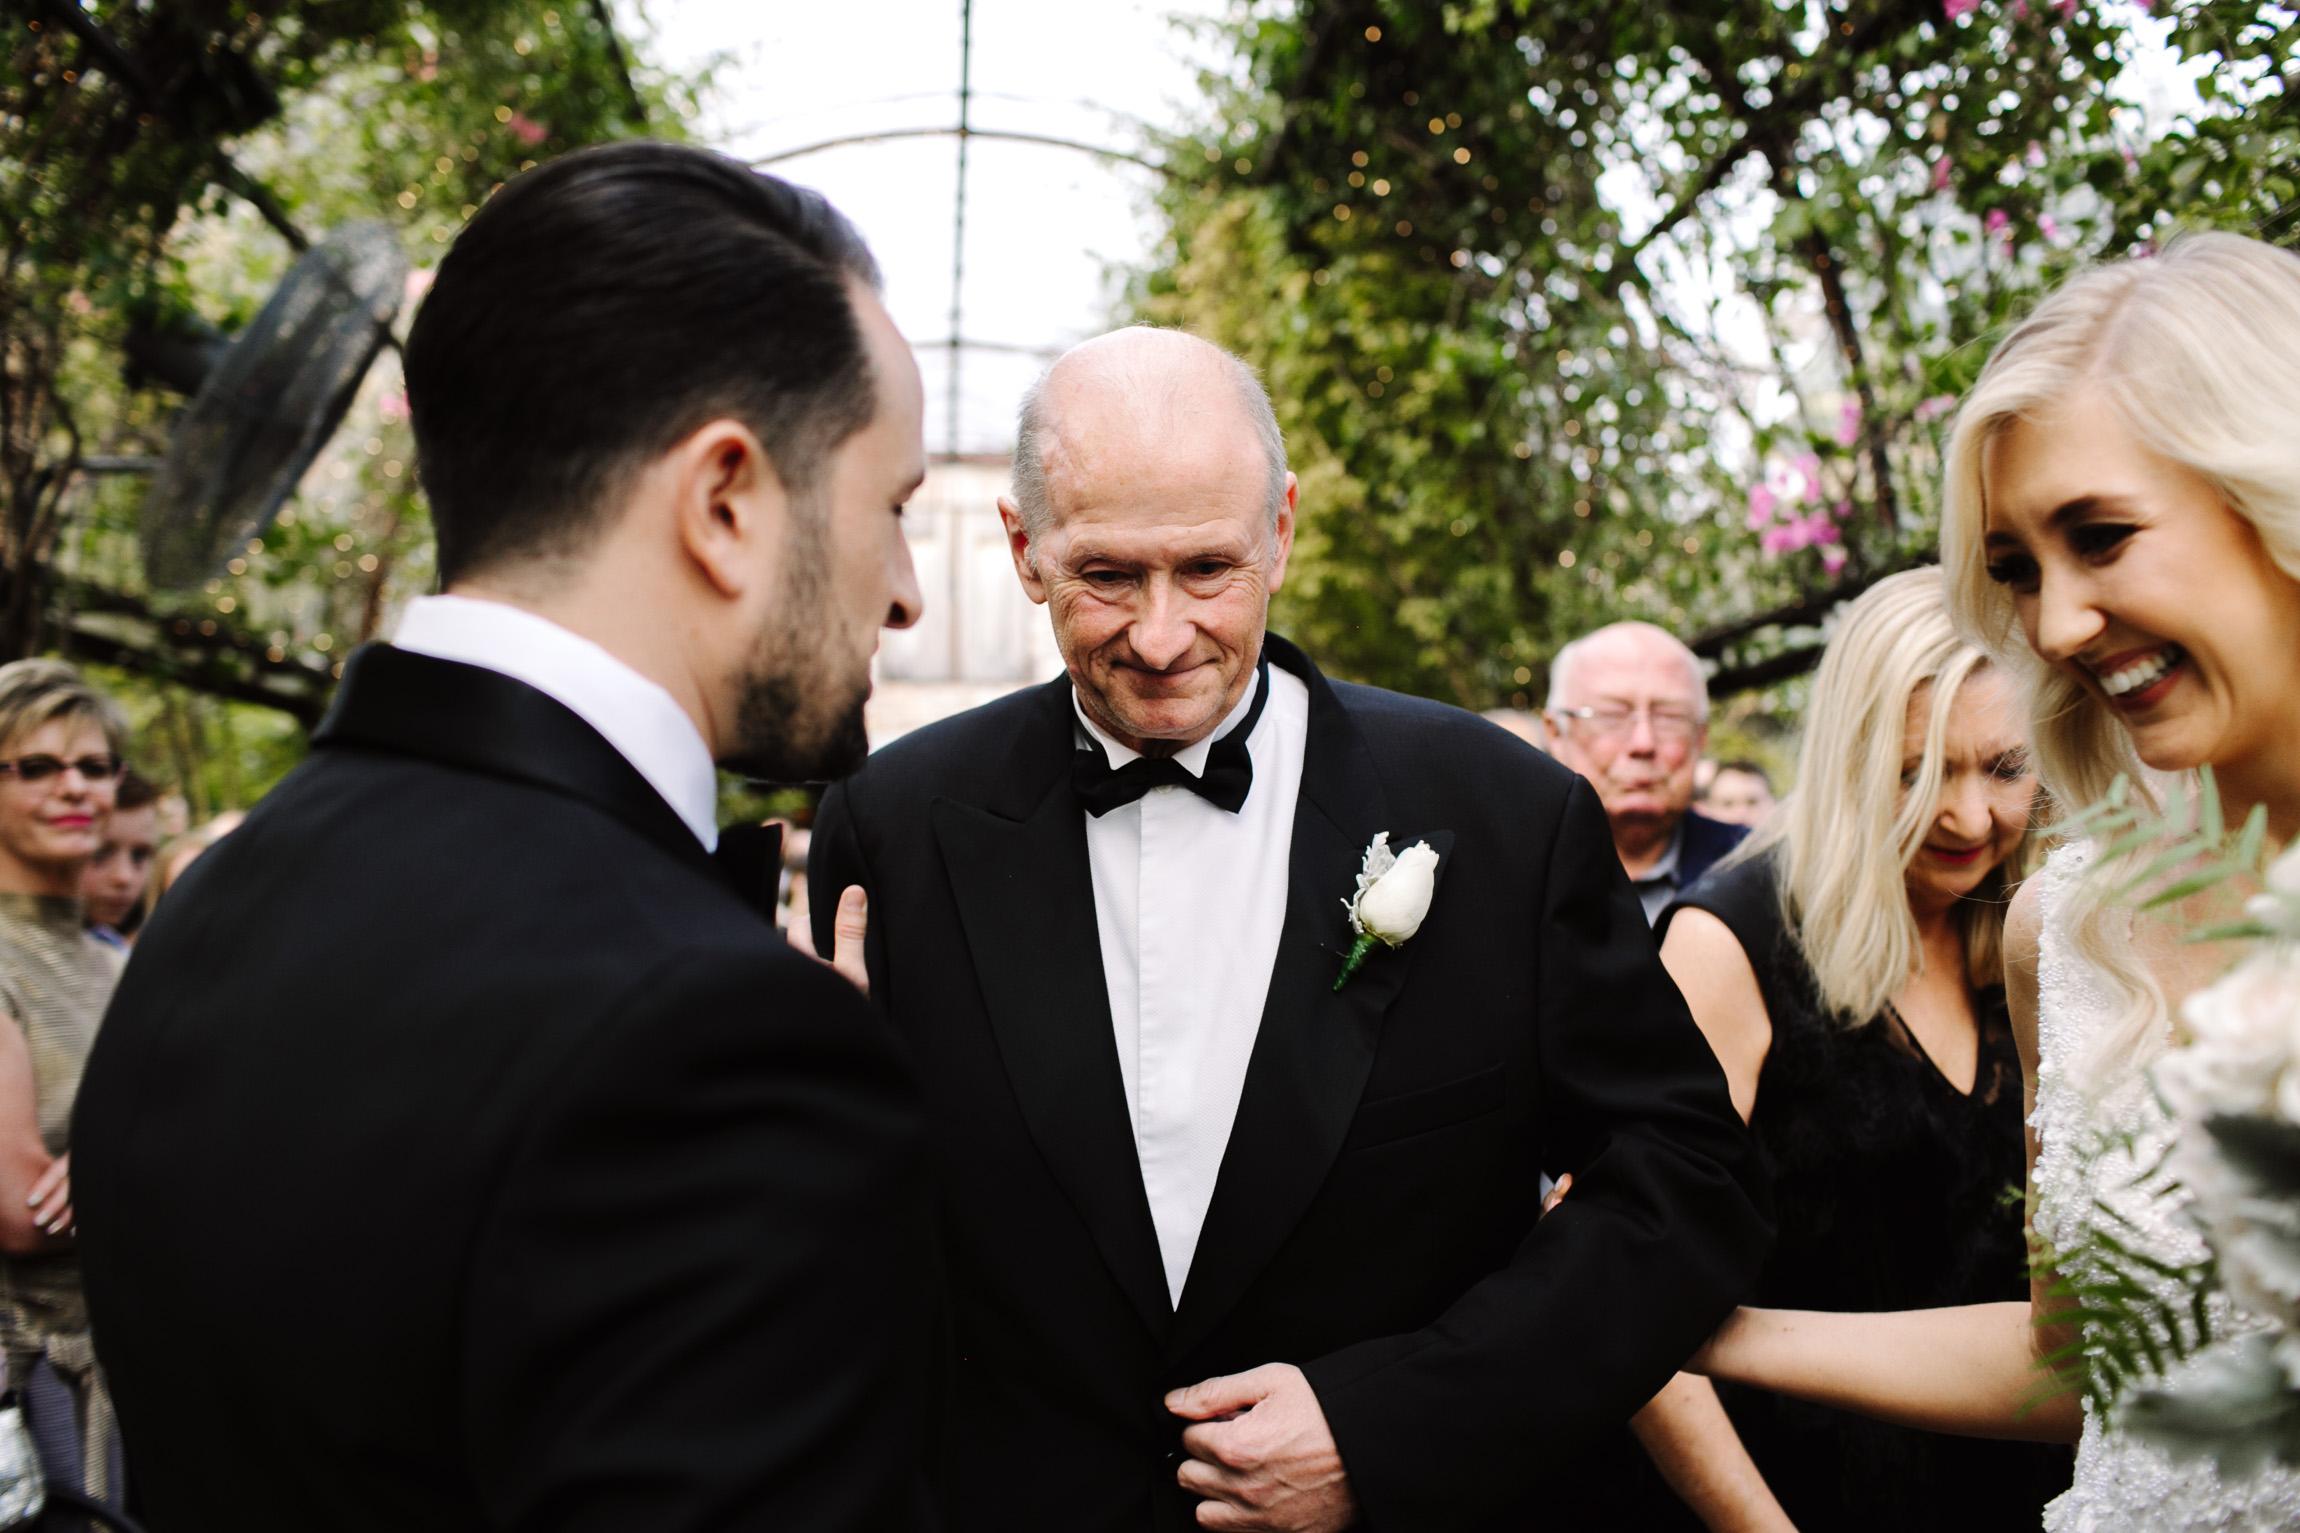 180223_justinaaron_wedding_charlotte_david_h-104.jpg